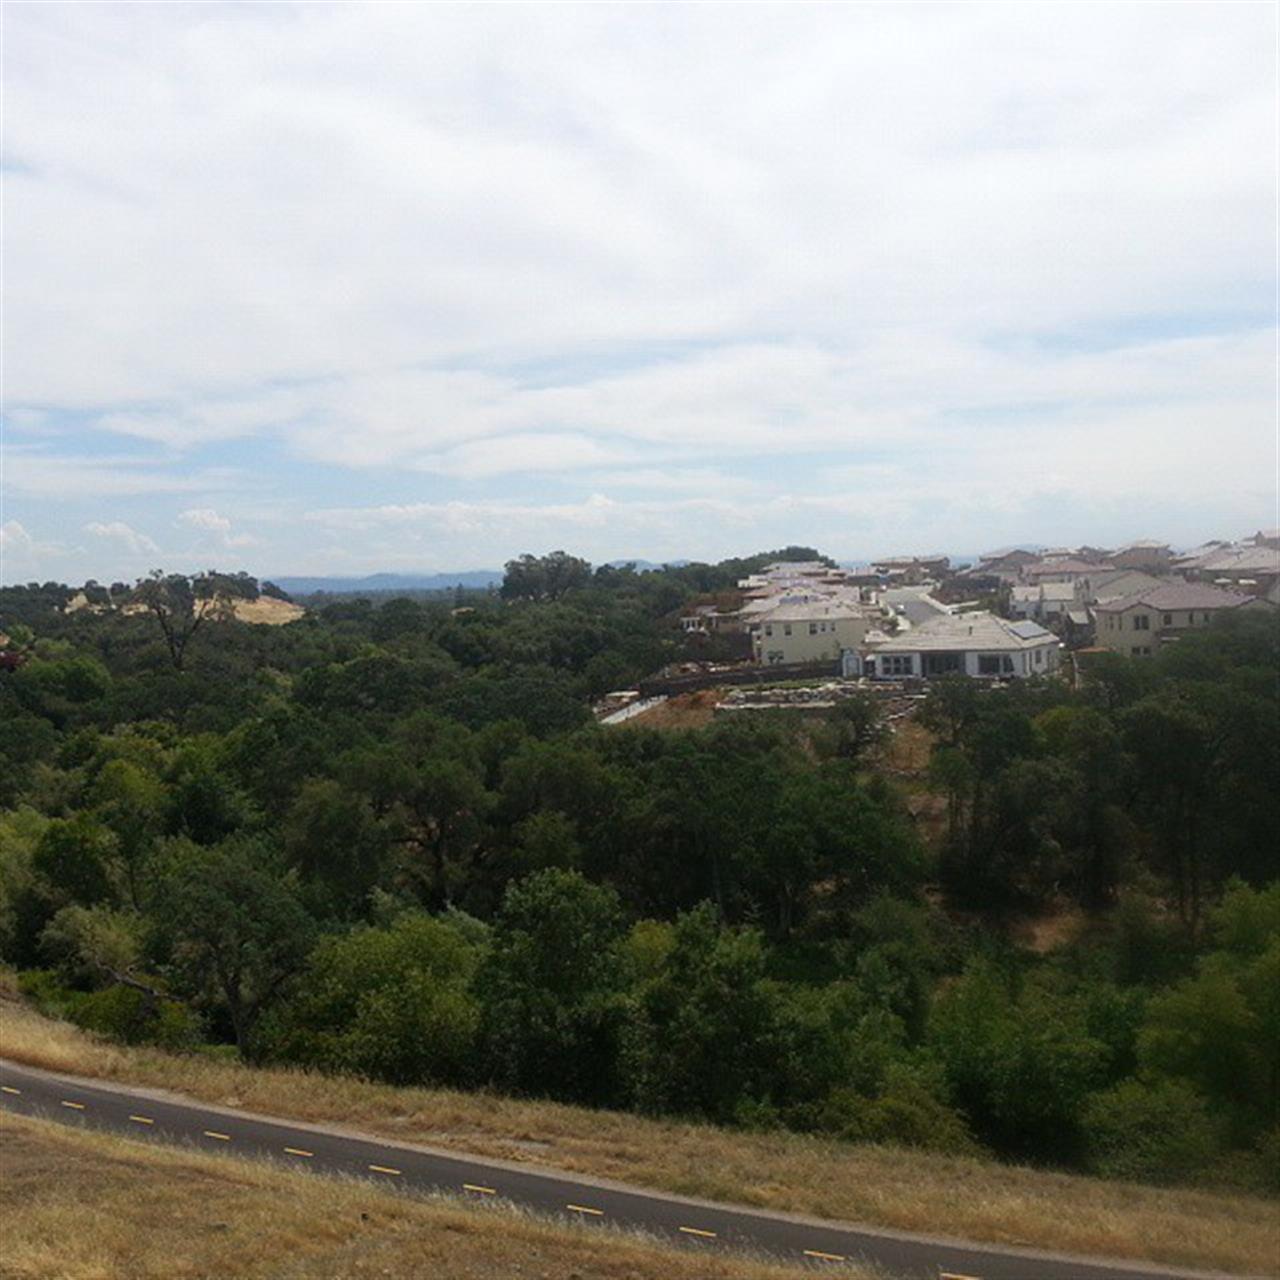 Beautiful Roseville, CA Views #leadingrelocal #lyonrealestate #rosevilleca